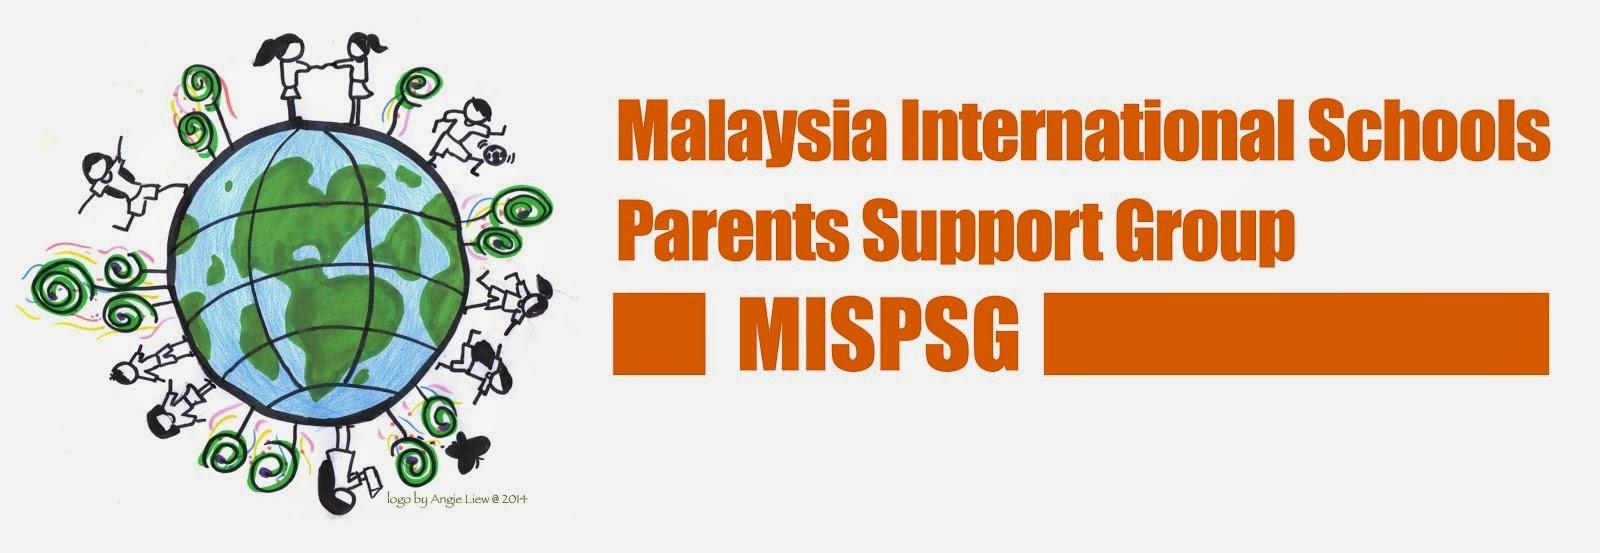 Malaysia international schools parents support group mispsg